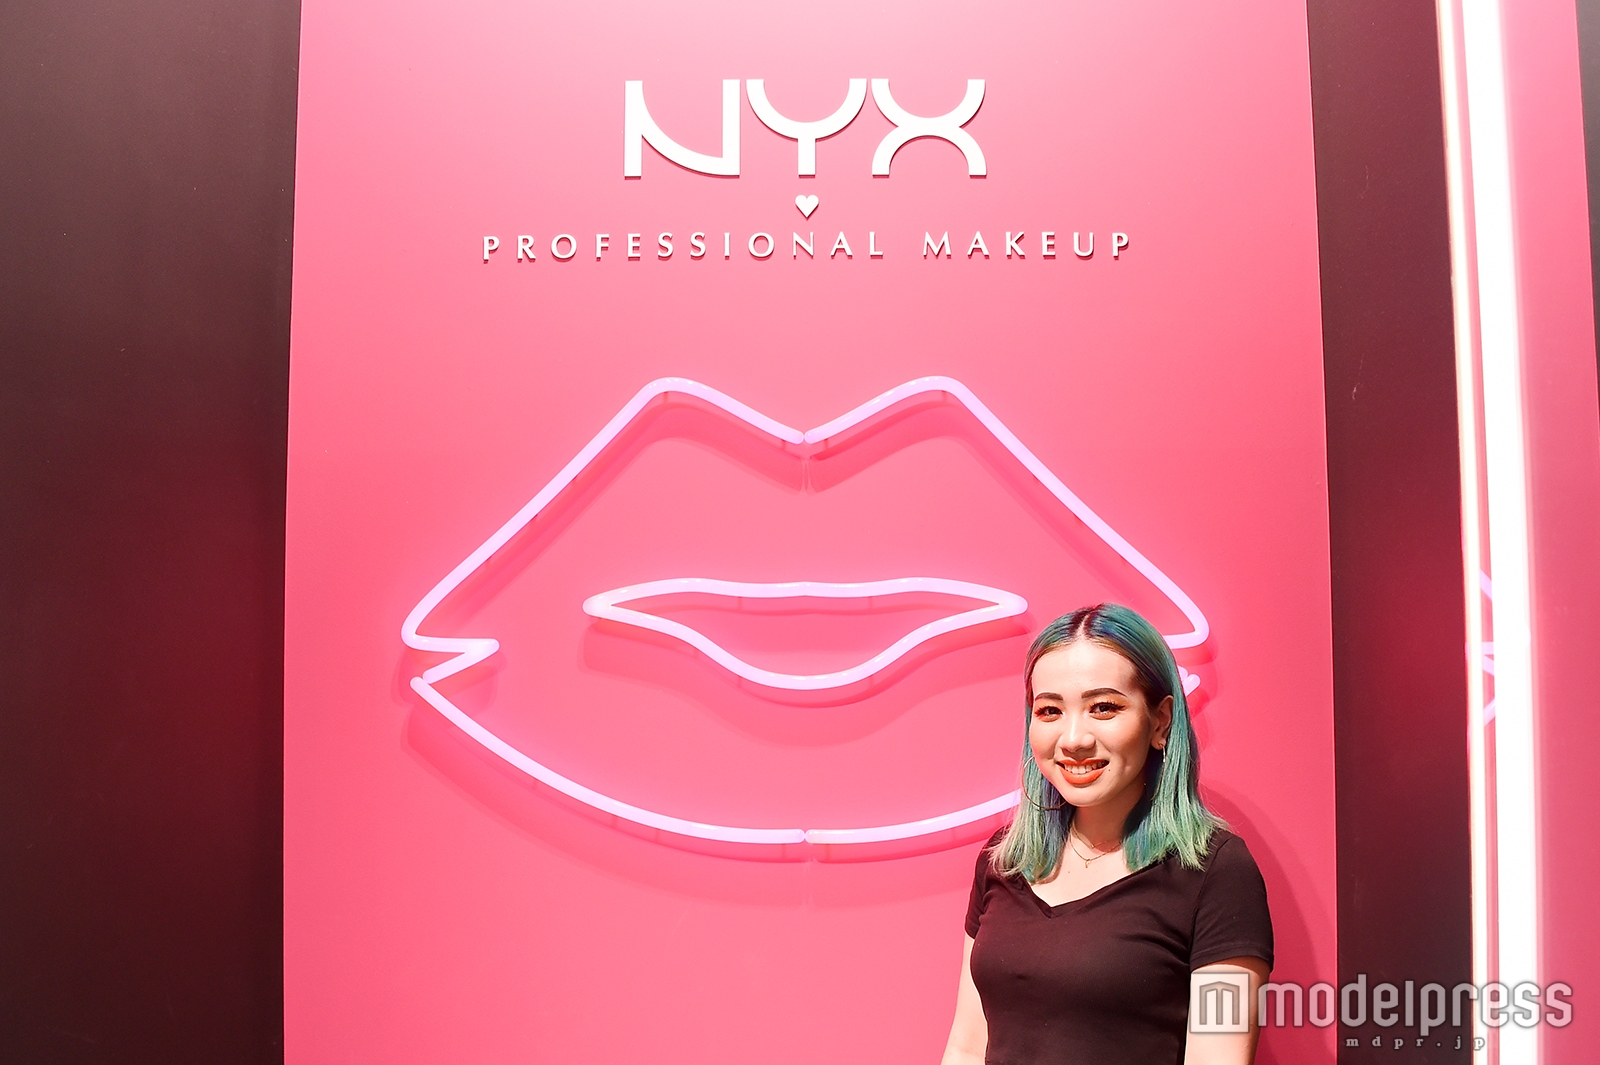 「NYX Professional Makeup」美容部員の呉屋真里奈さん(C)モデルプレス